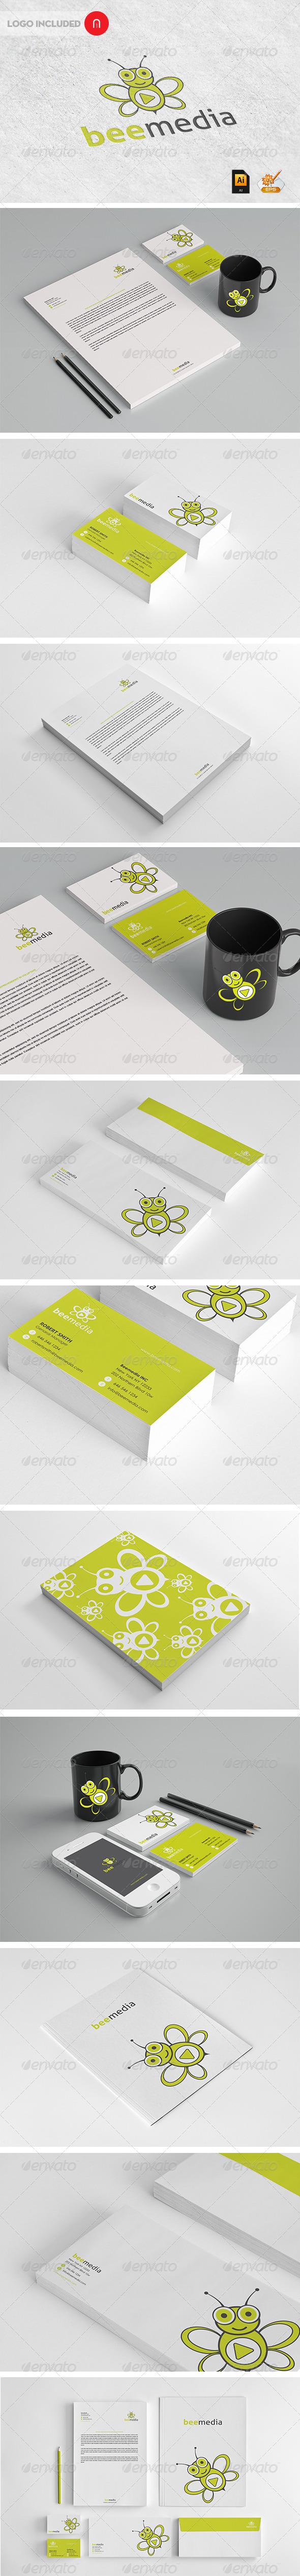 GraphicRiver Stationary & Identity Bee Media 3456161